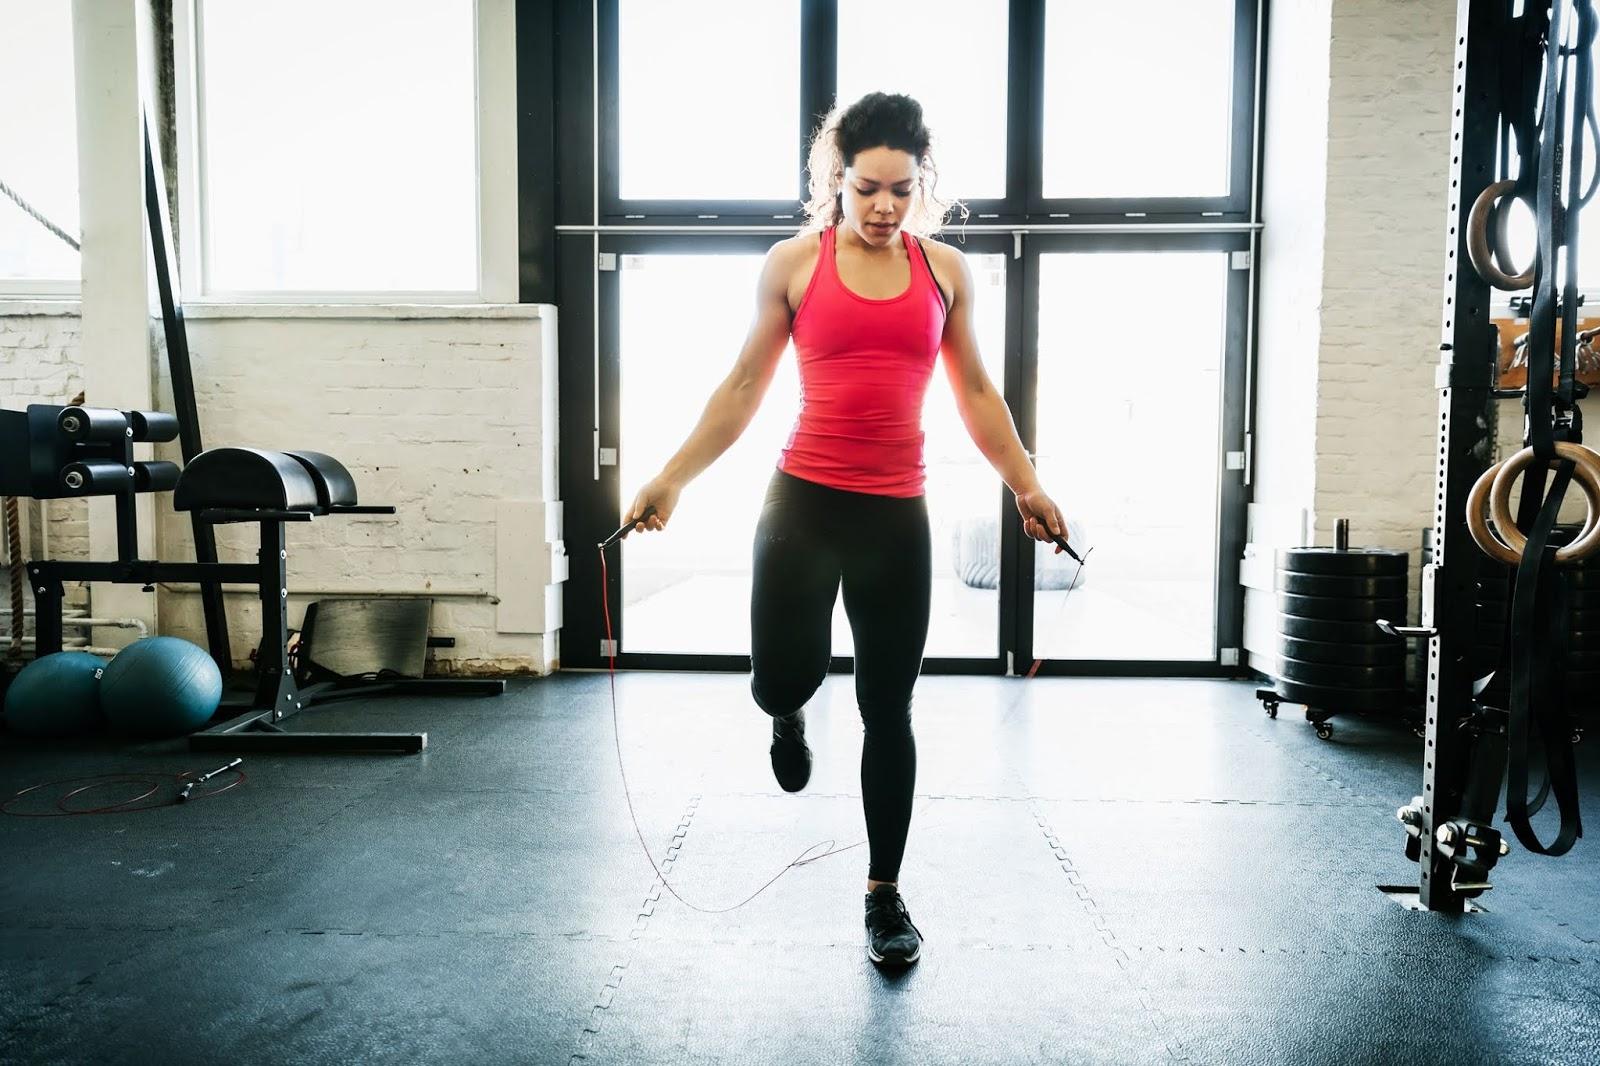 8 Best Exercises For Women Over 40